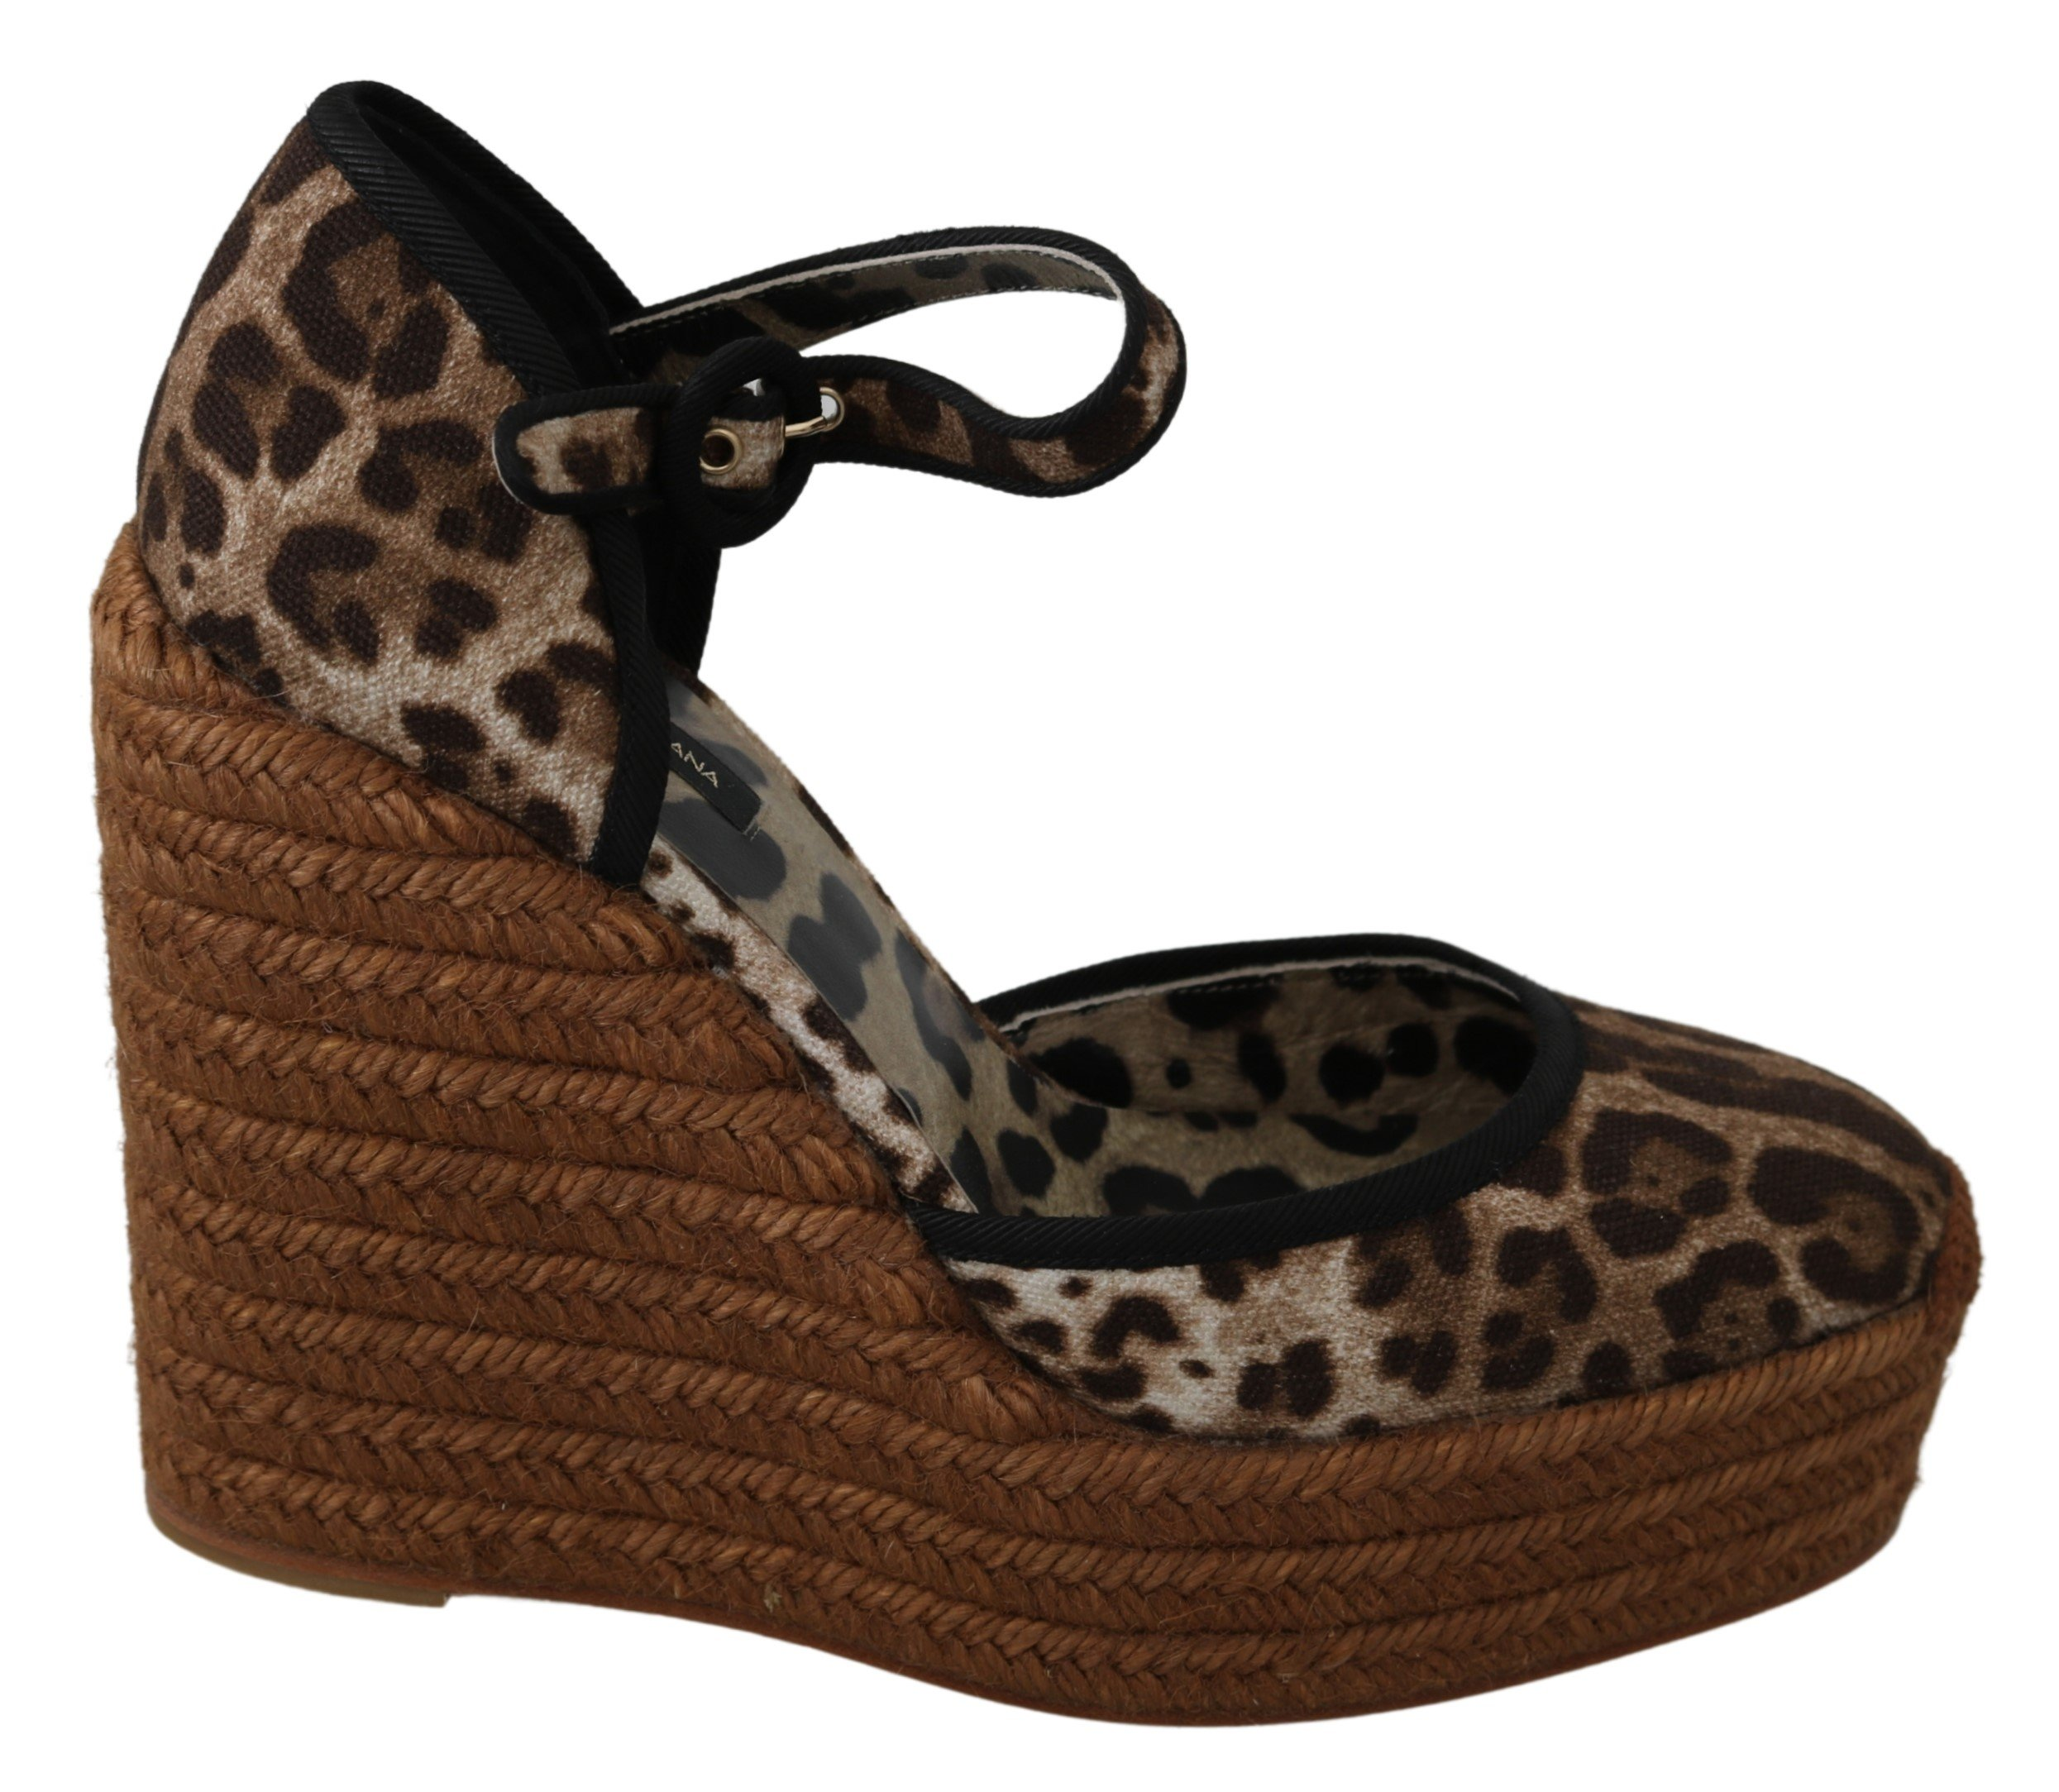 Dolce & Gabbana Women's Leopard Ankle Strap Sandal Brown LA7255 - EU39/US8.5